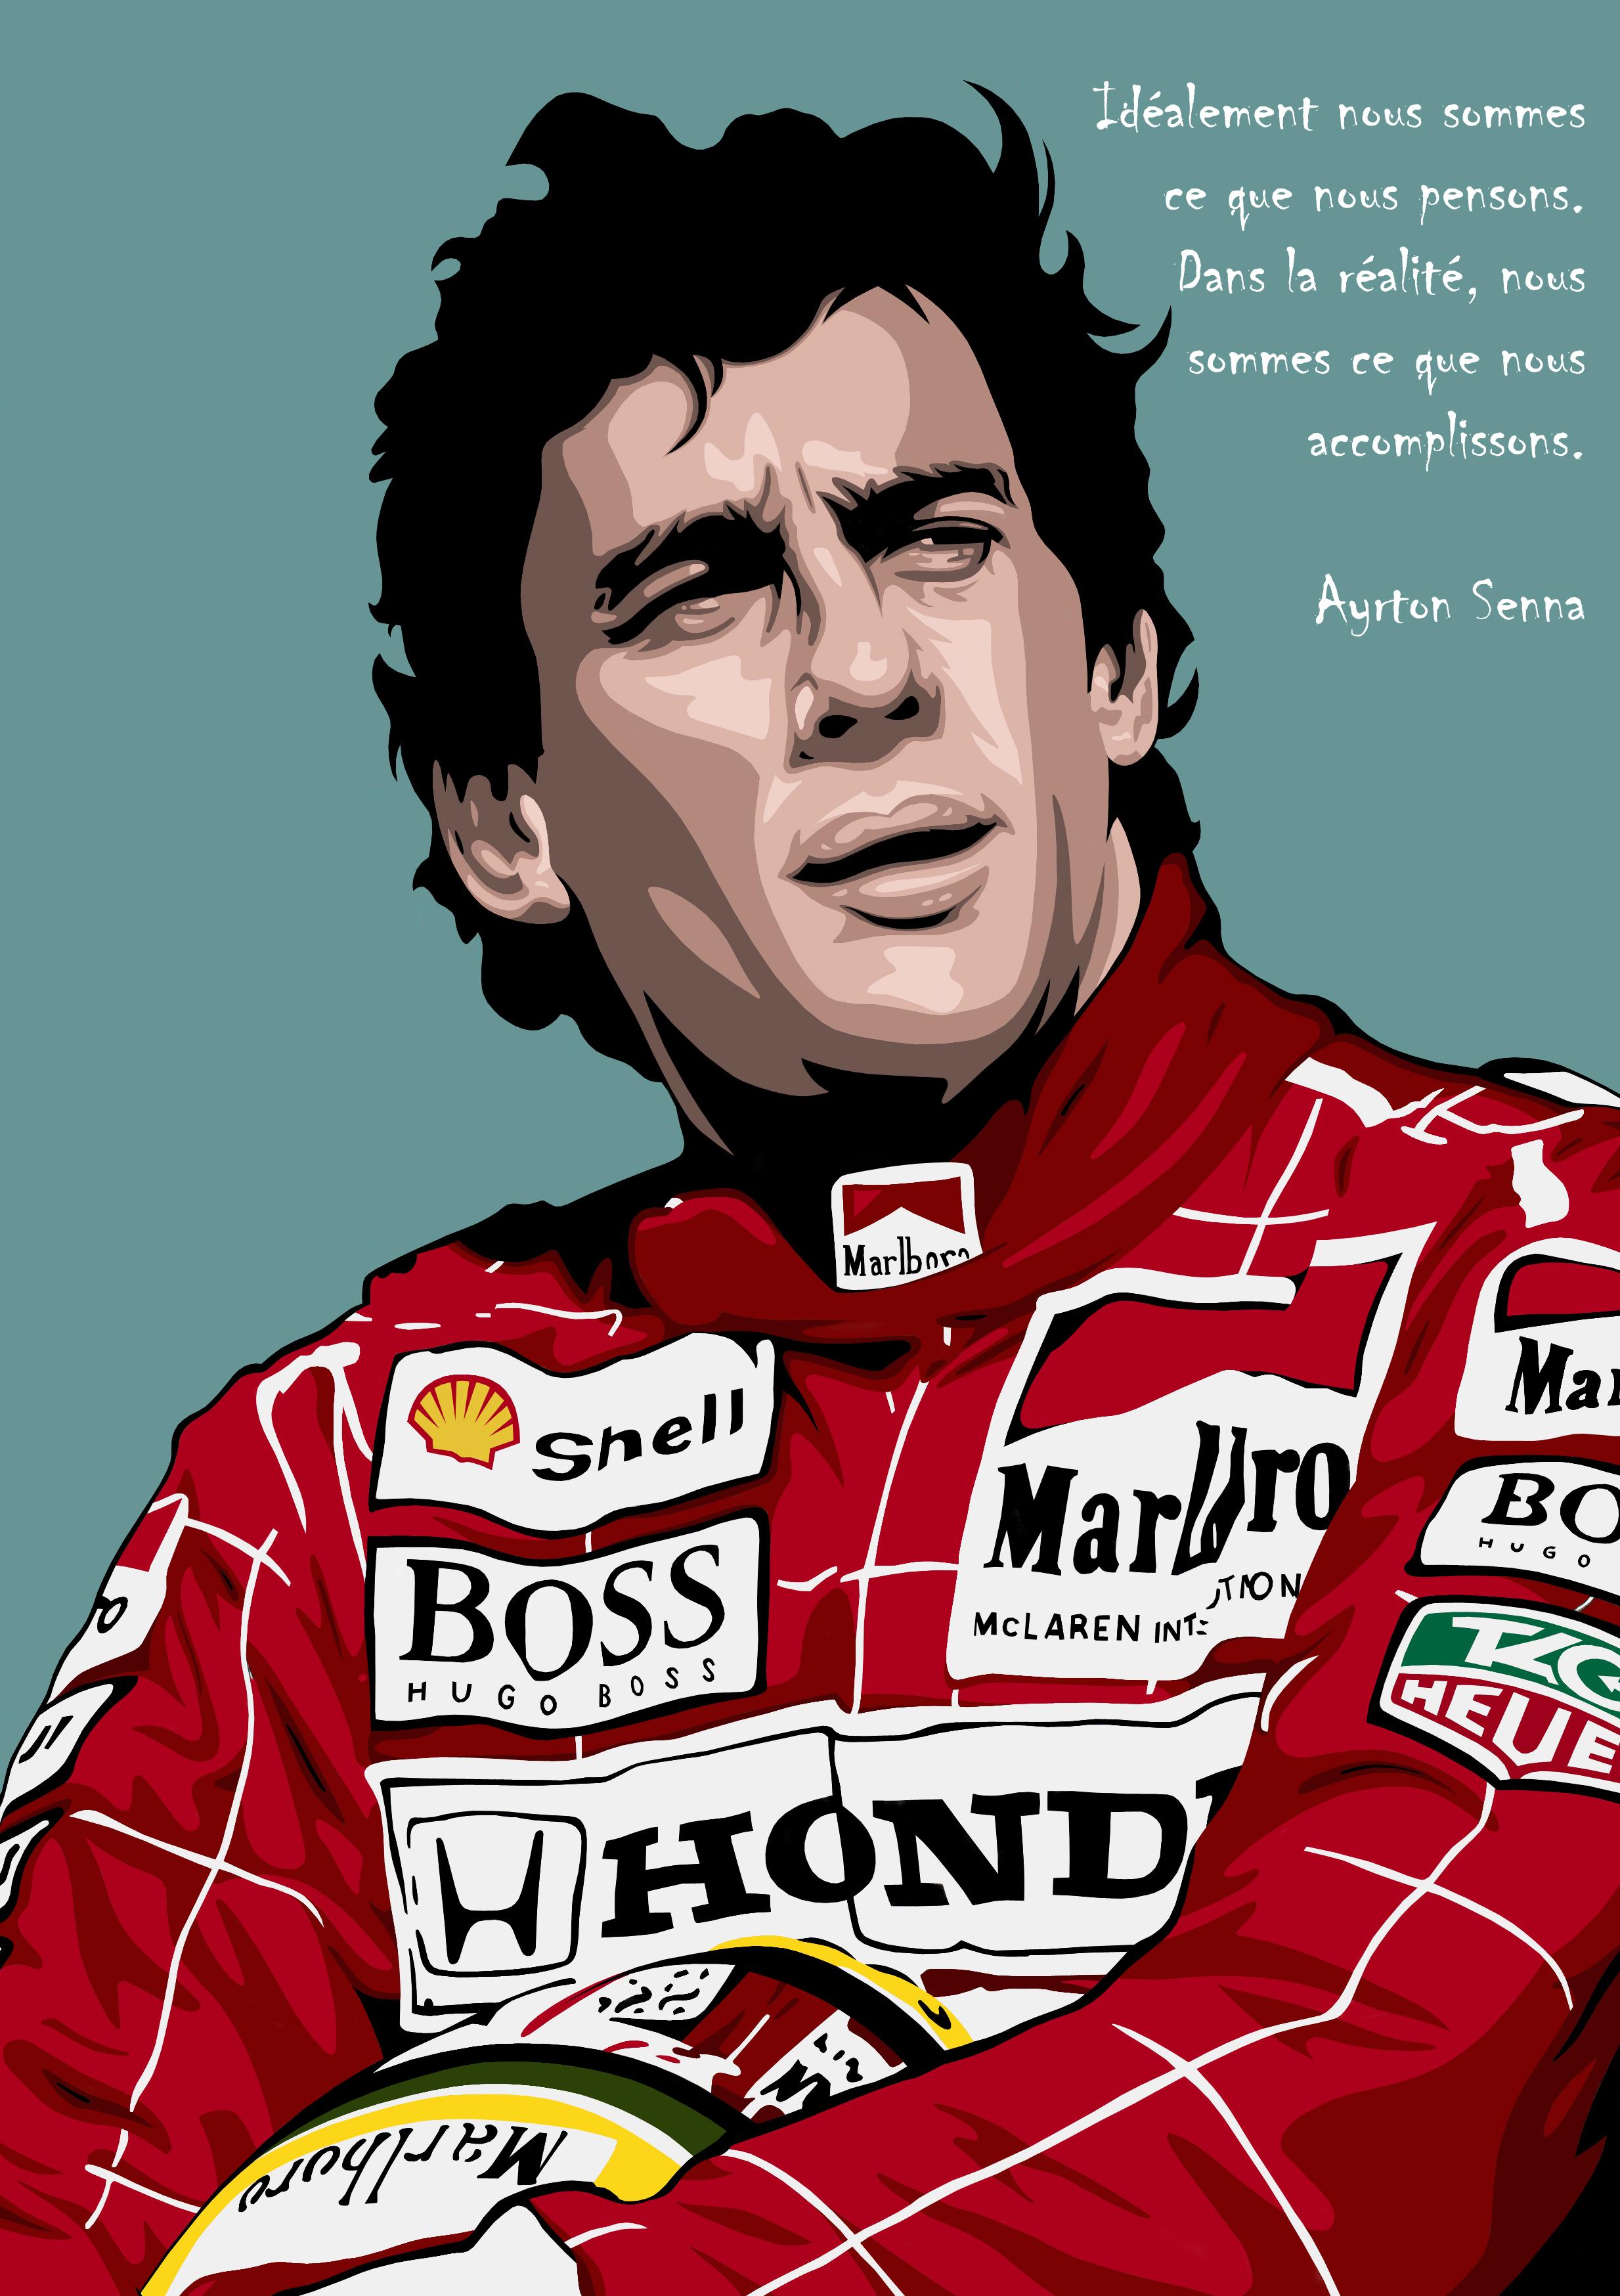 Dessin Ayrton Senna couleur de Adrien72140